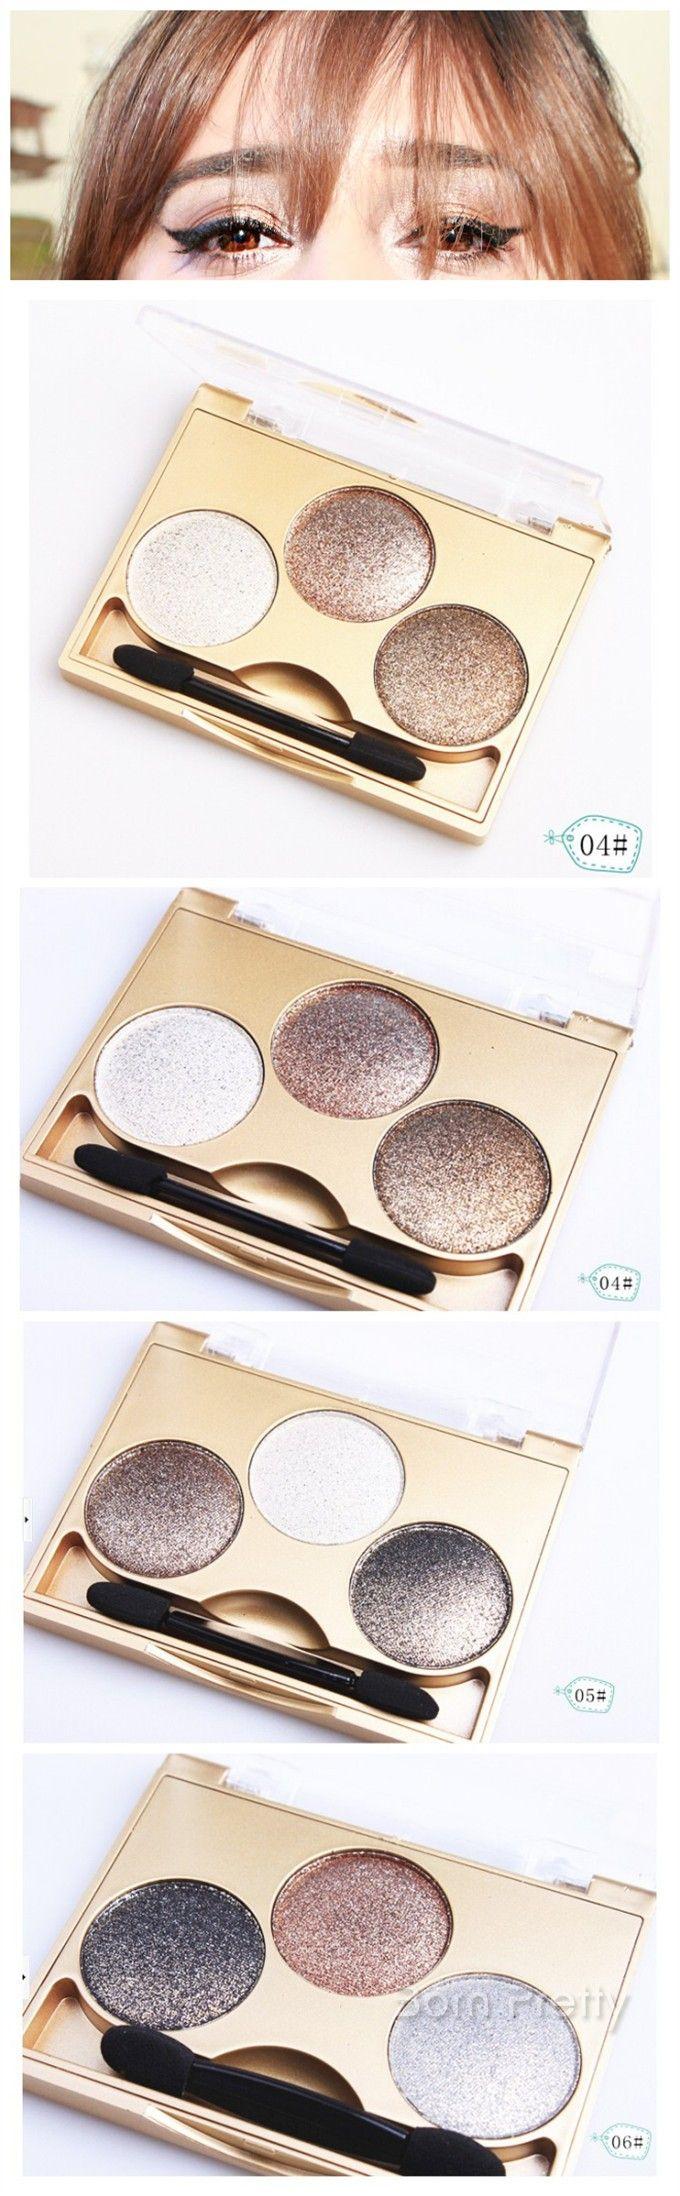 $3.99 3 Colors Stunning Eye Shimmer Eyeshadow Palette Waterproof Eyeshadow 3 Patterns - BornPrettyStore.com